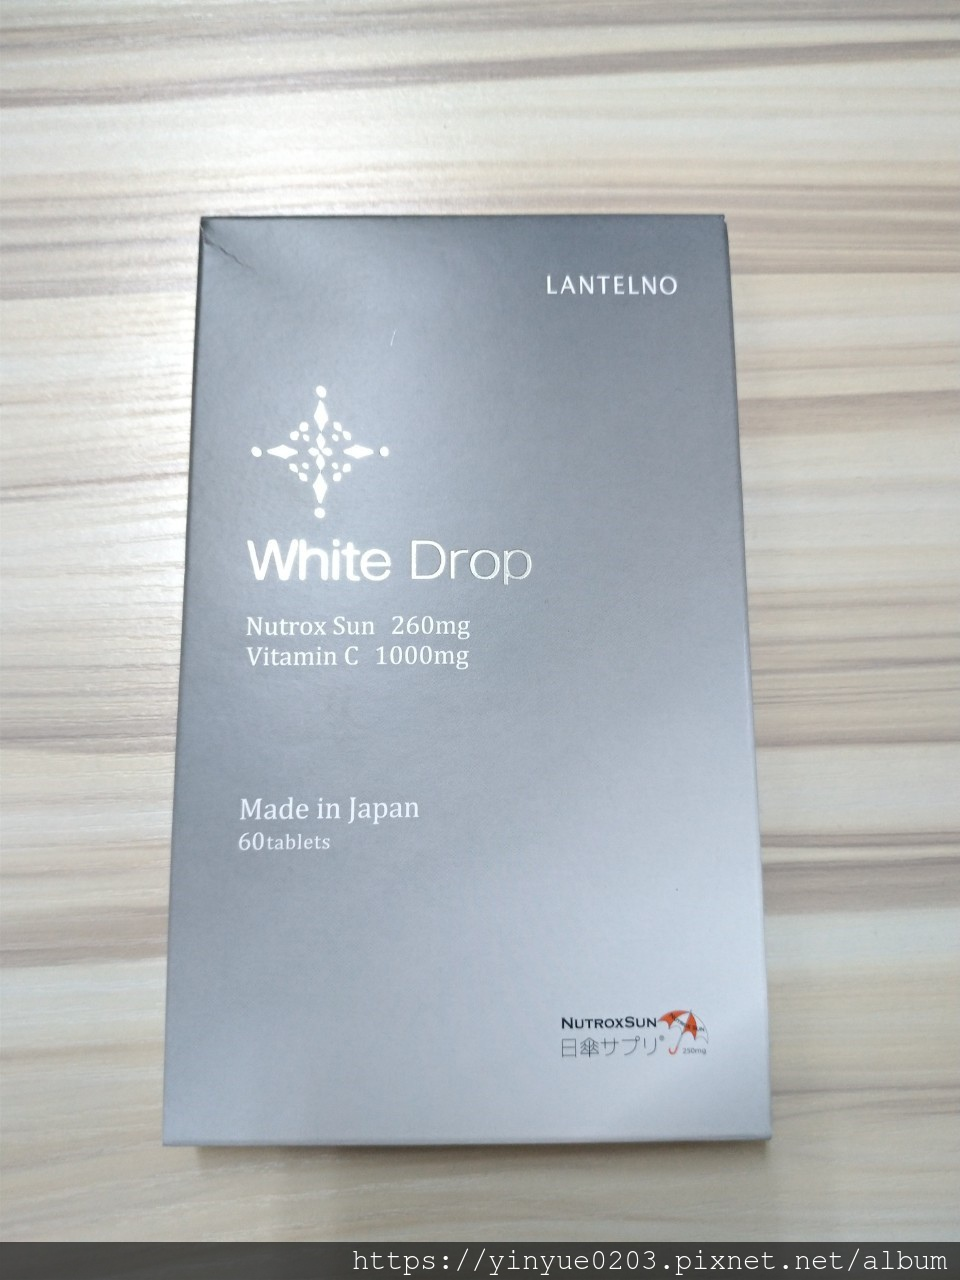 White Drop煥白防曬錠外觀